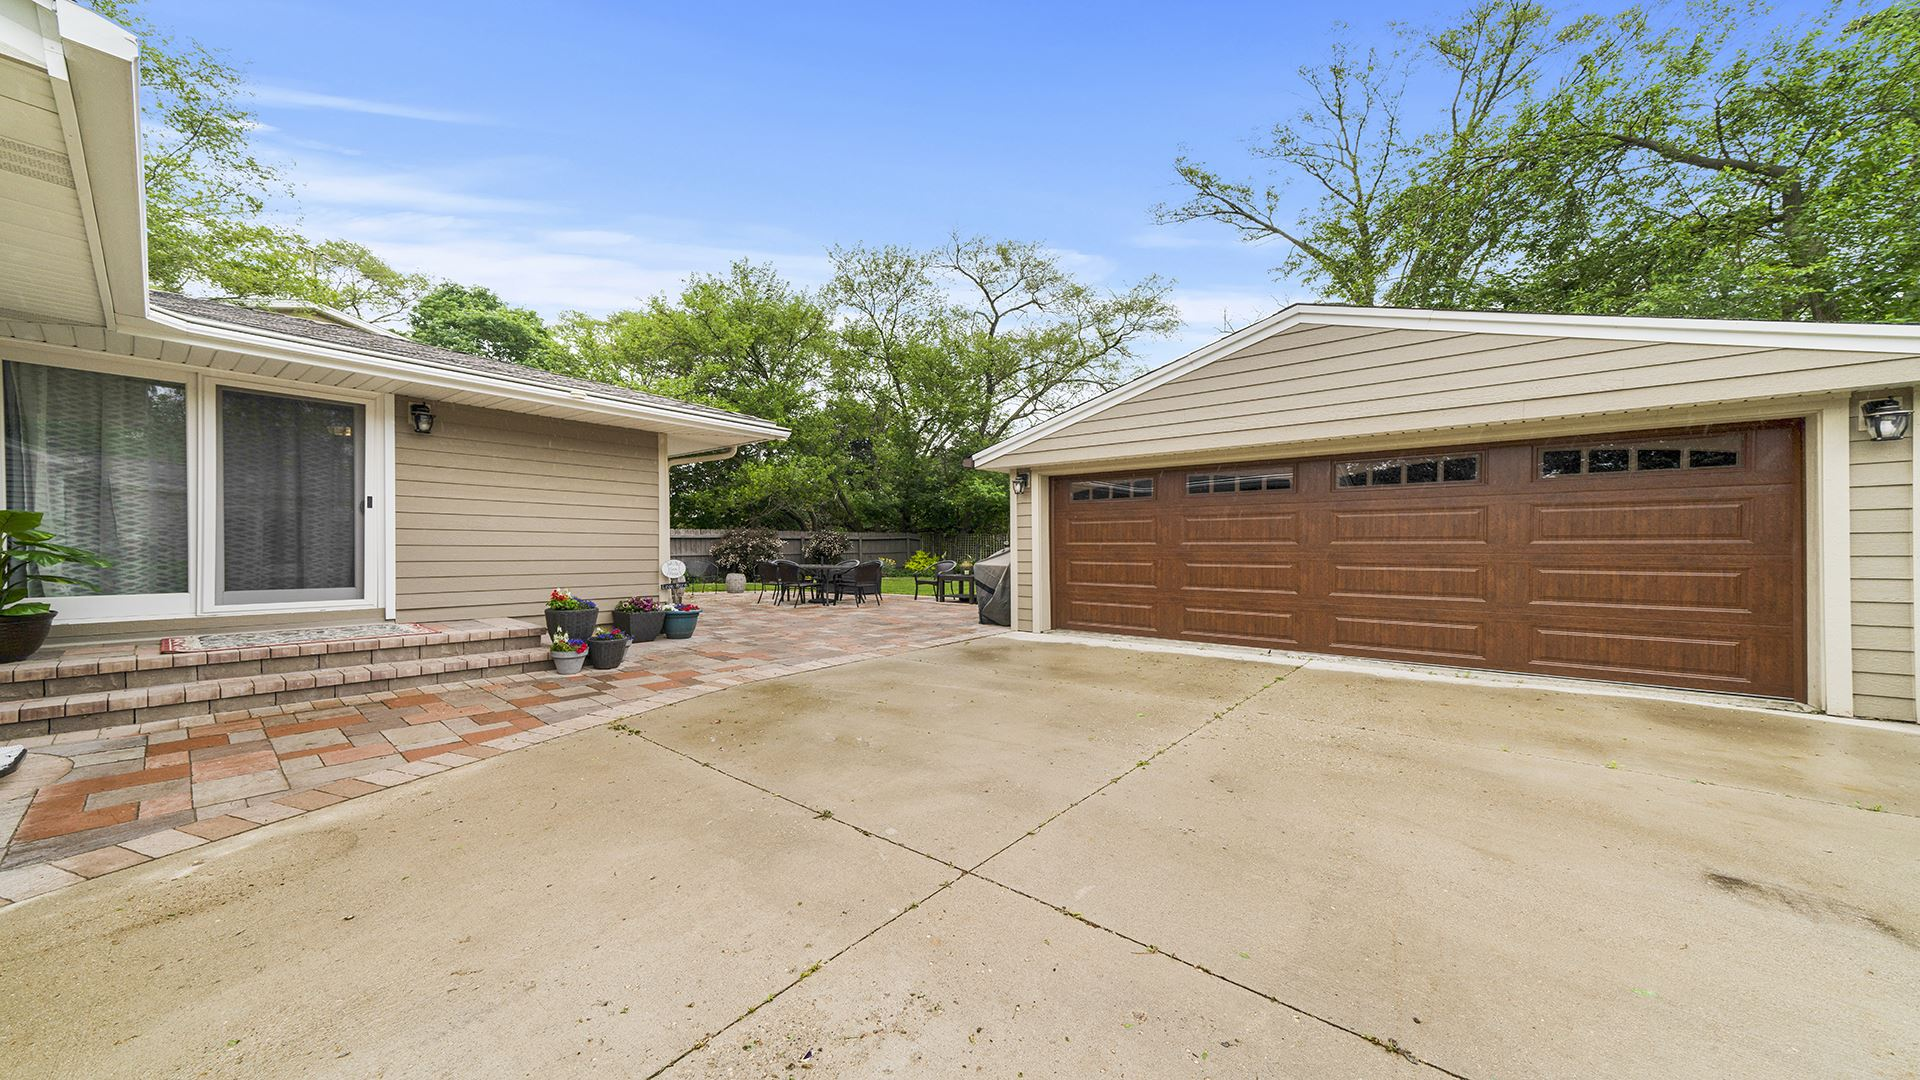 395 Linn Avenue, Crystal Lake, IL 60014 - #: 11110782